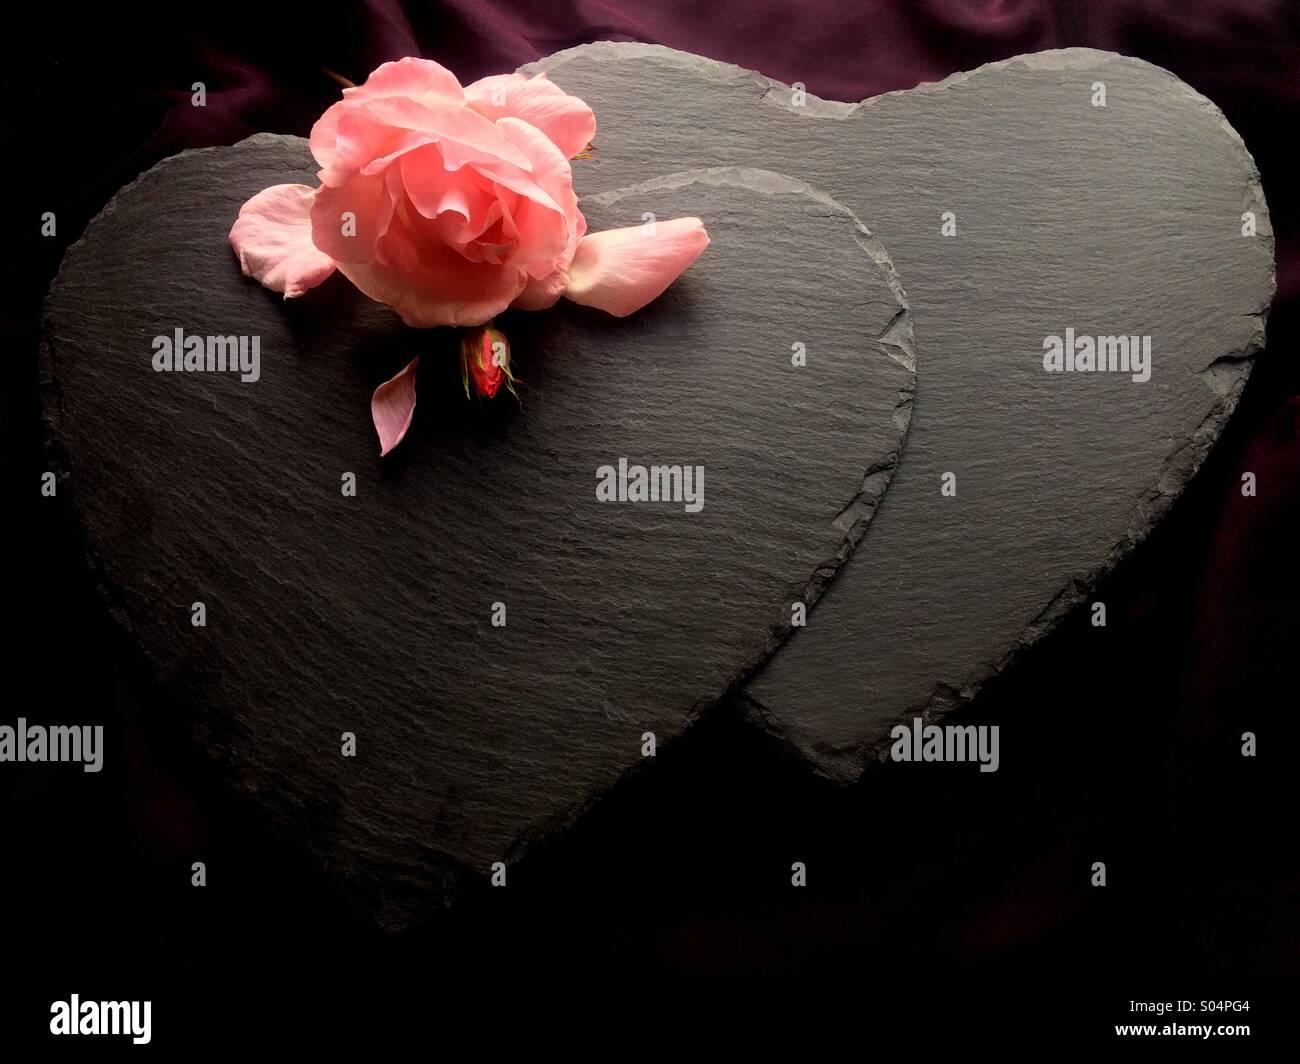 Tough love - Stock Image